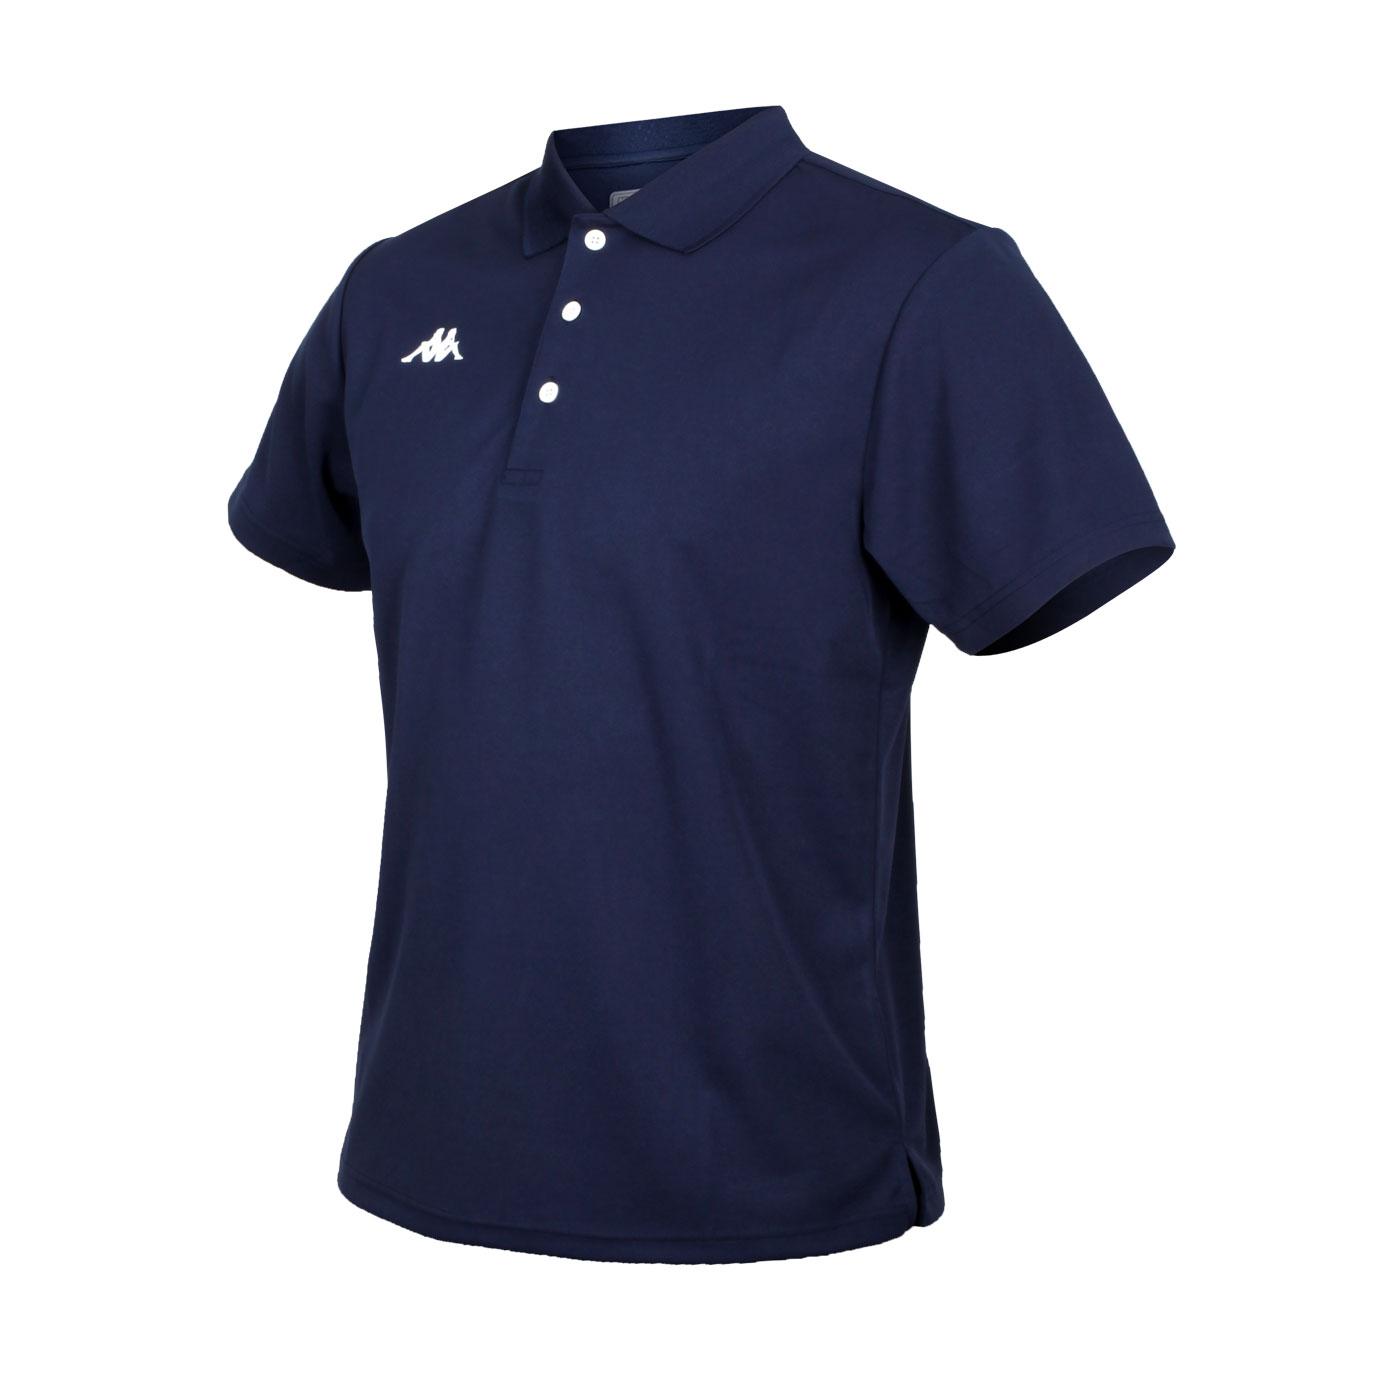 KAPPA 男款K4T短袖POLO衫 321762W-B29 - 丈青白